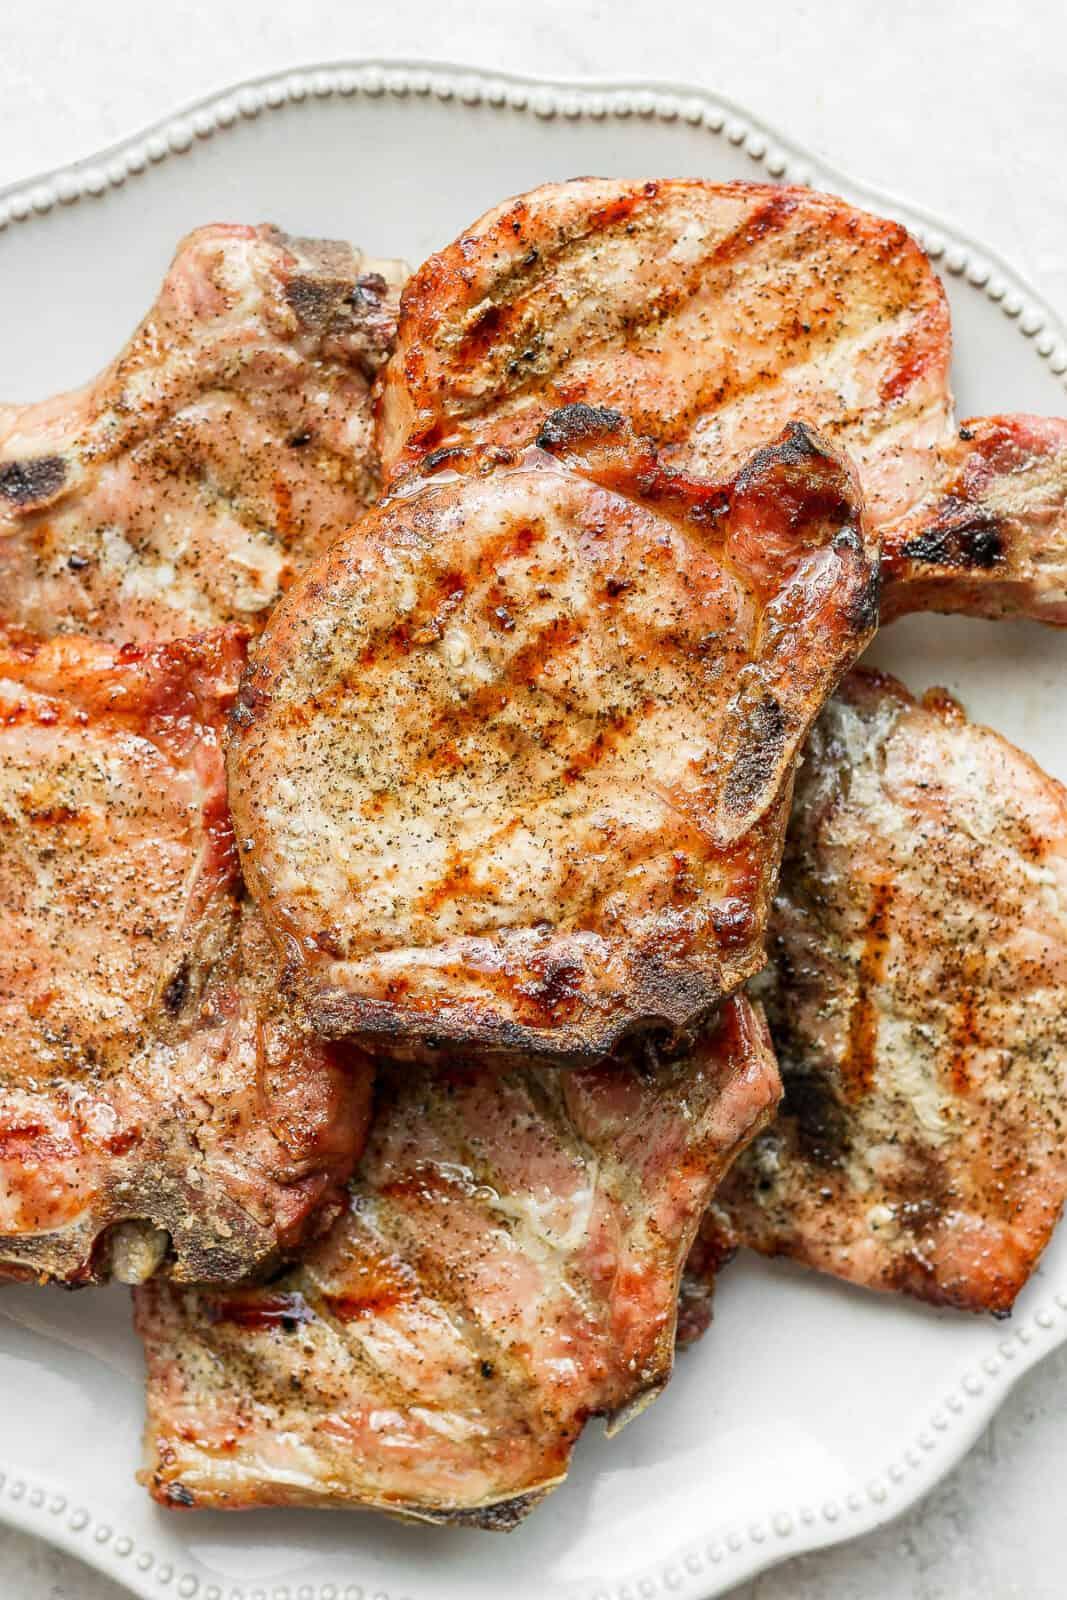 Plate of smoked pork chops.